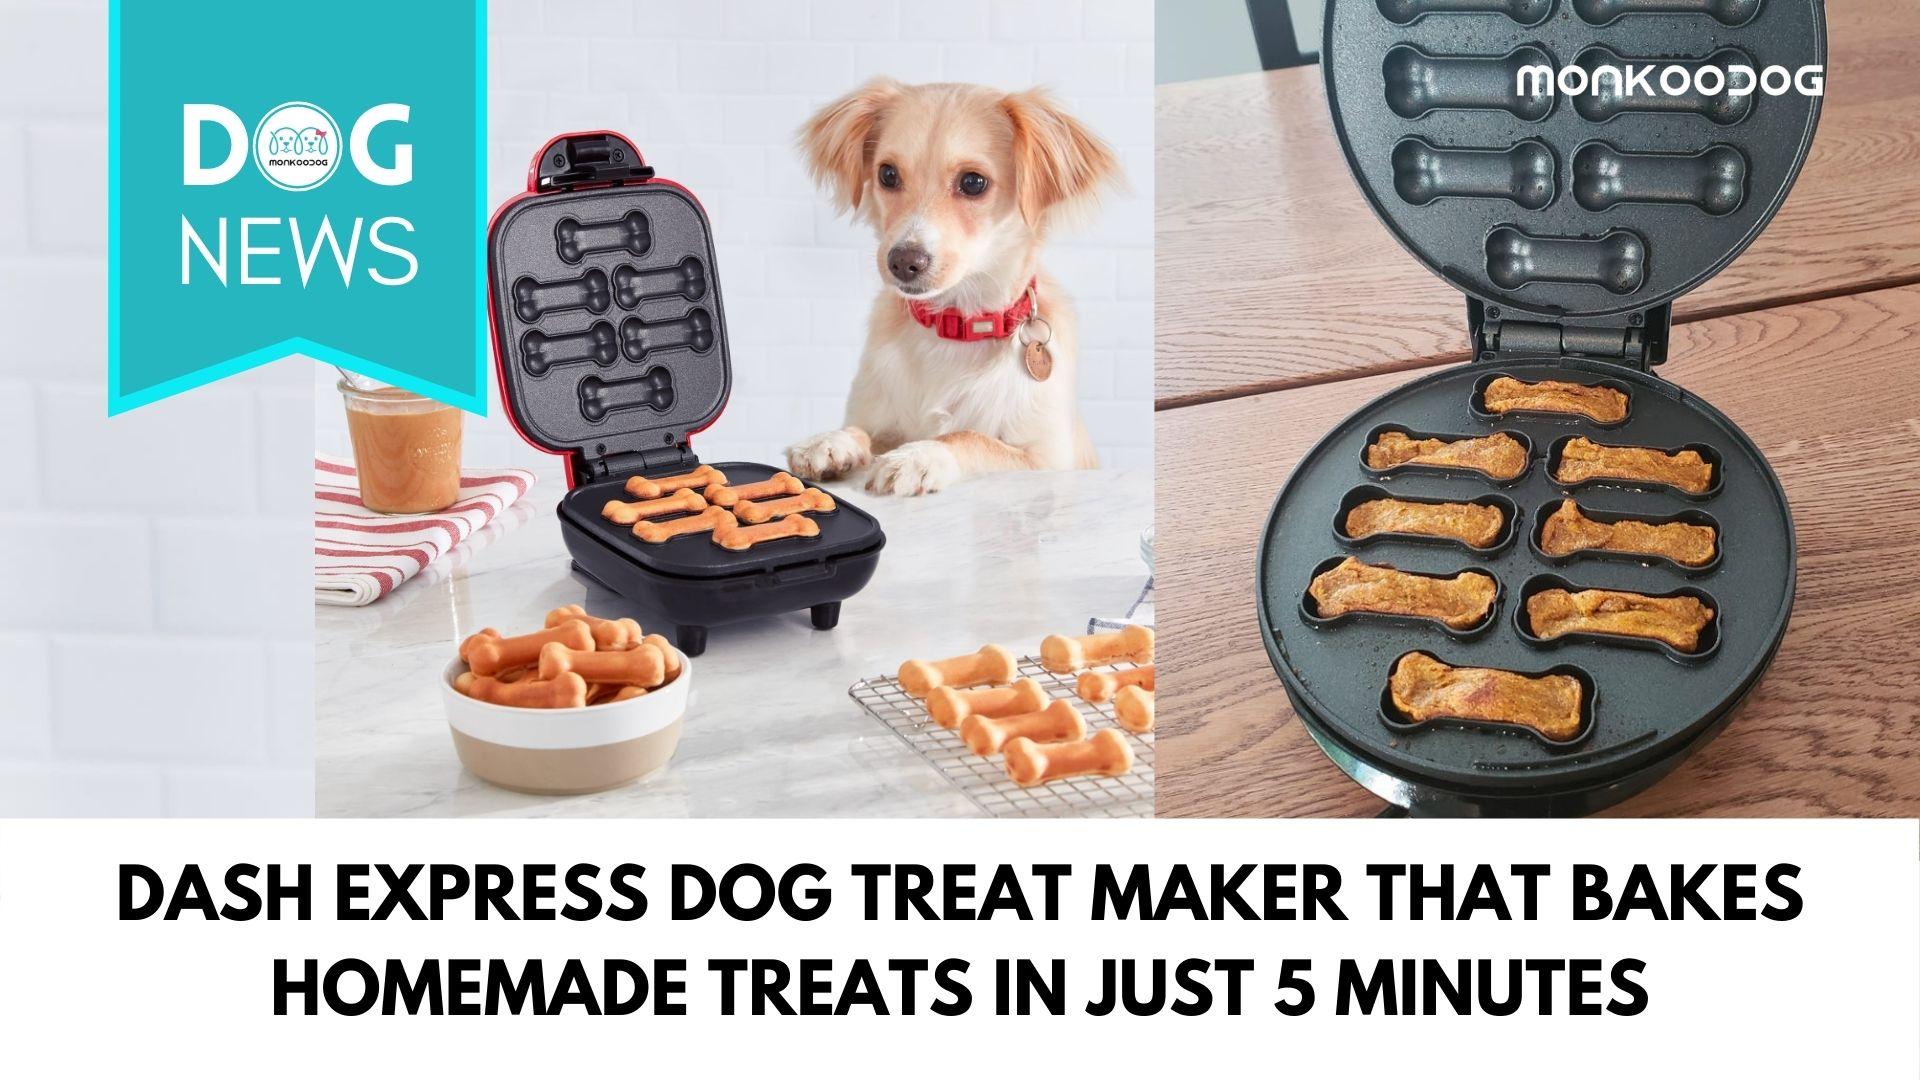 Dash Express Dog Treat Maker that bakes homemade treats in just 5 minutesDash Express Dog Treat Maker that bakes homemade treats in just 5 minutes